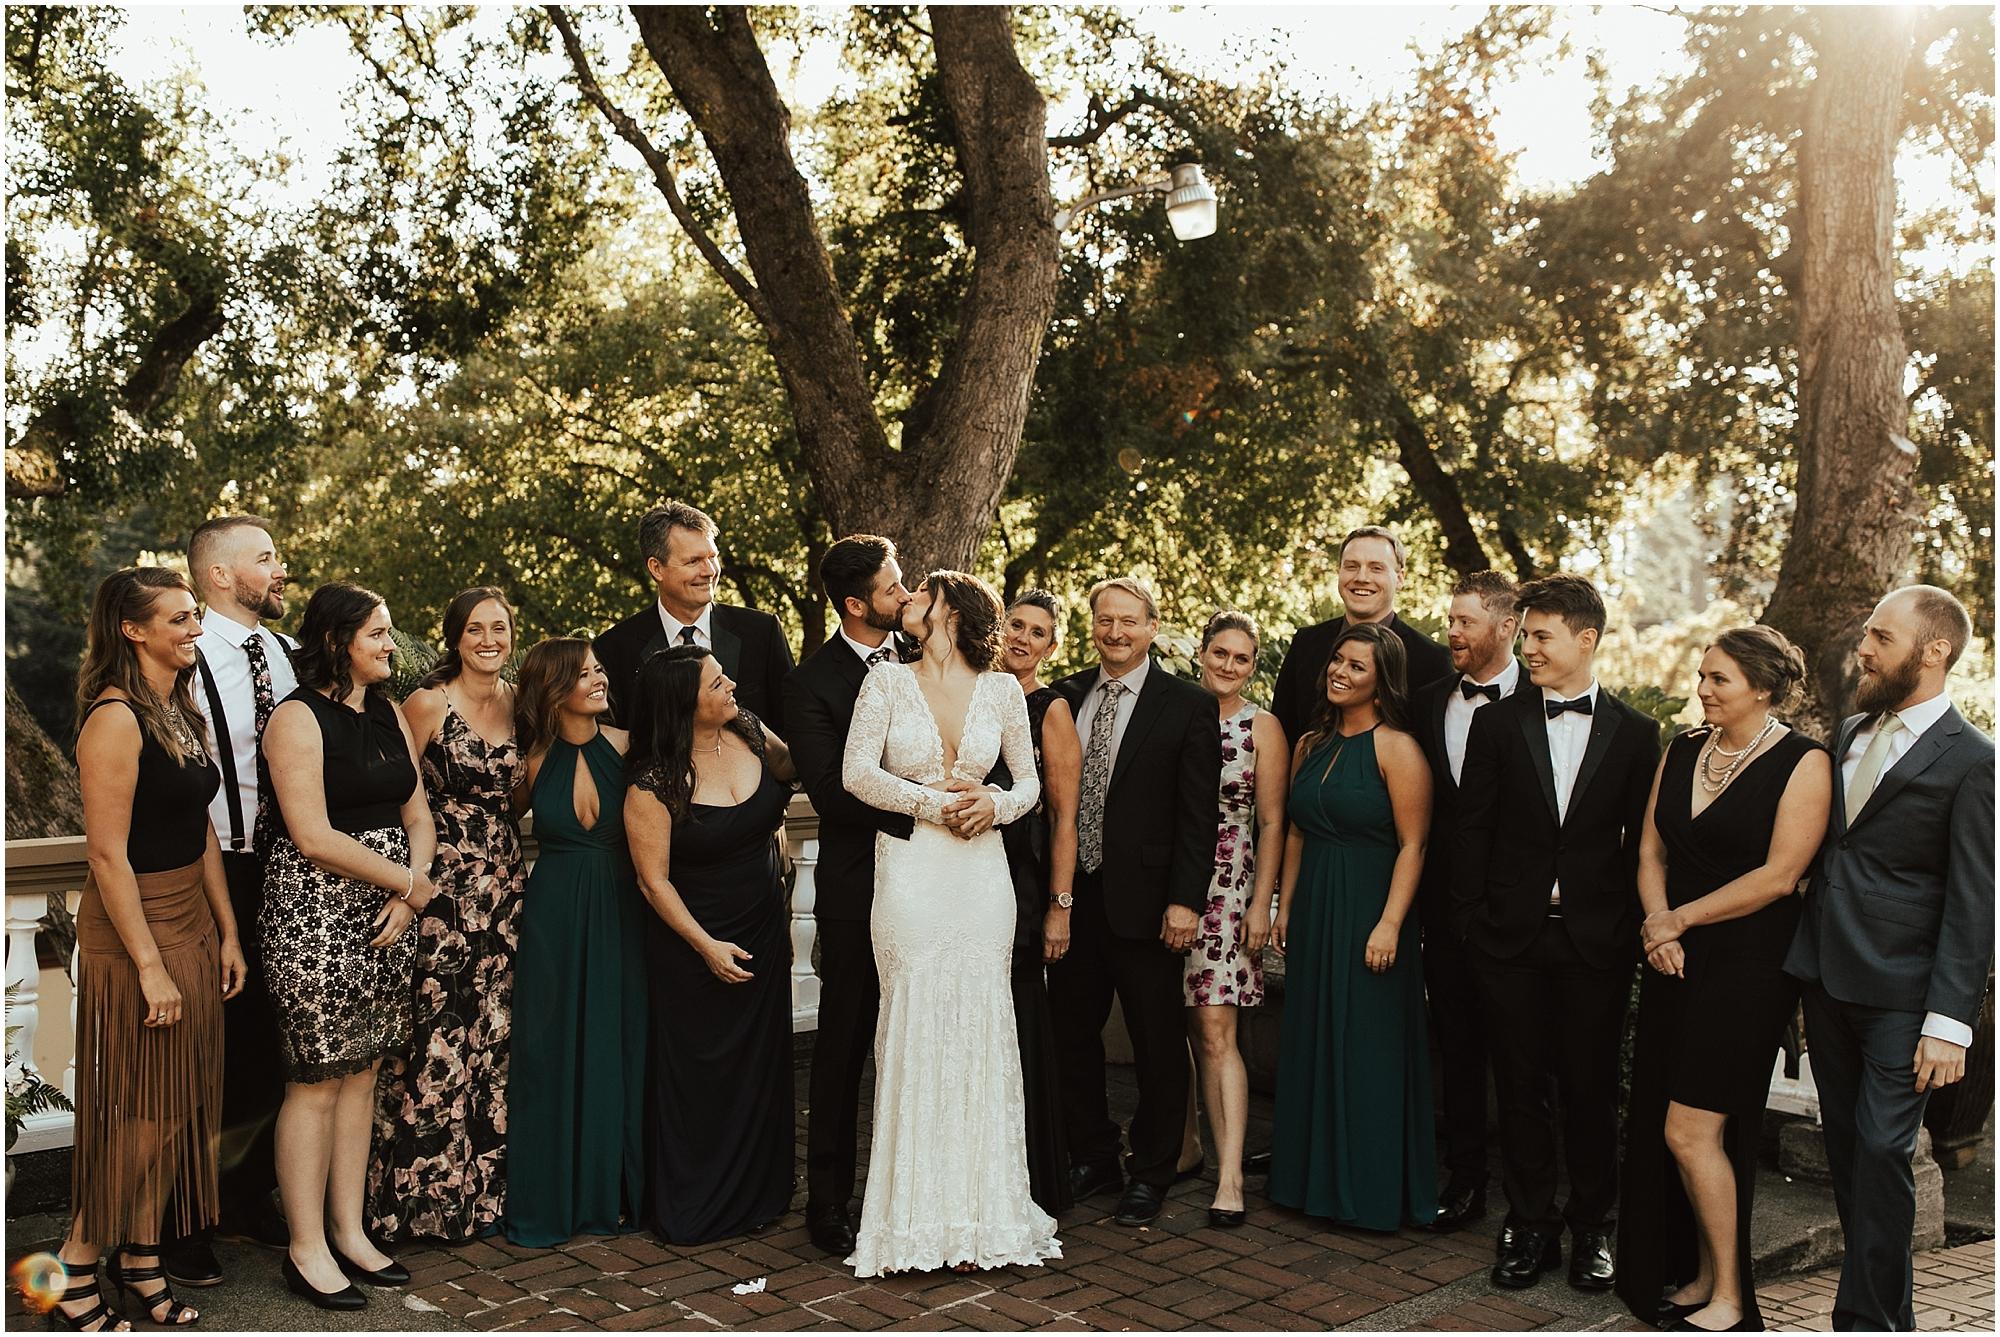 Lairmont Manor Wedding Bellingham Cassie Trottier Photo1064.jpg